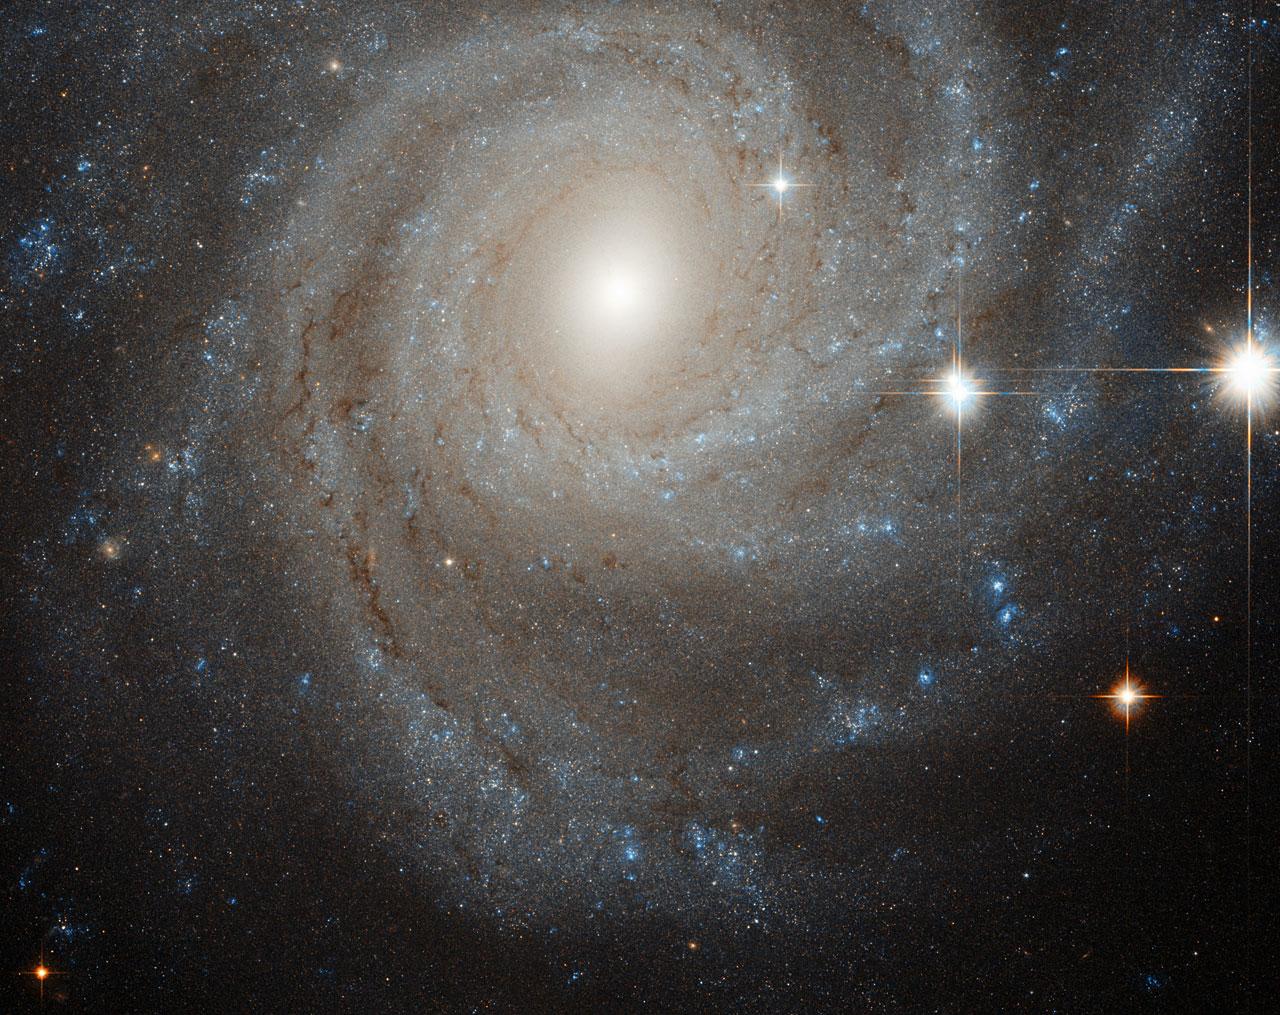 milky way hubble telescope gallery - photo #19